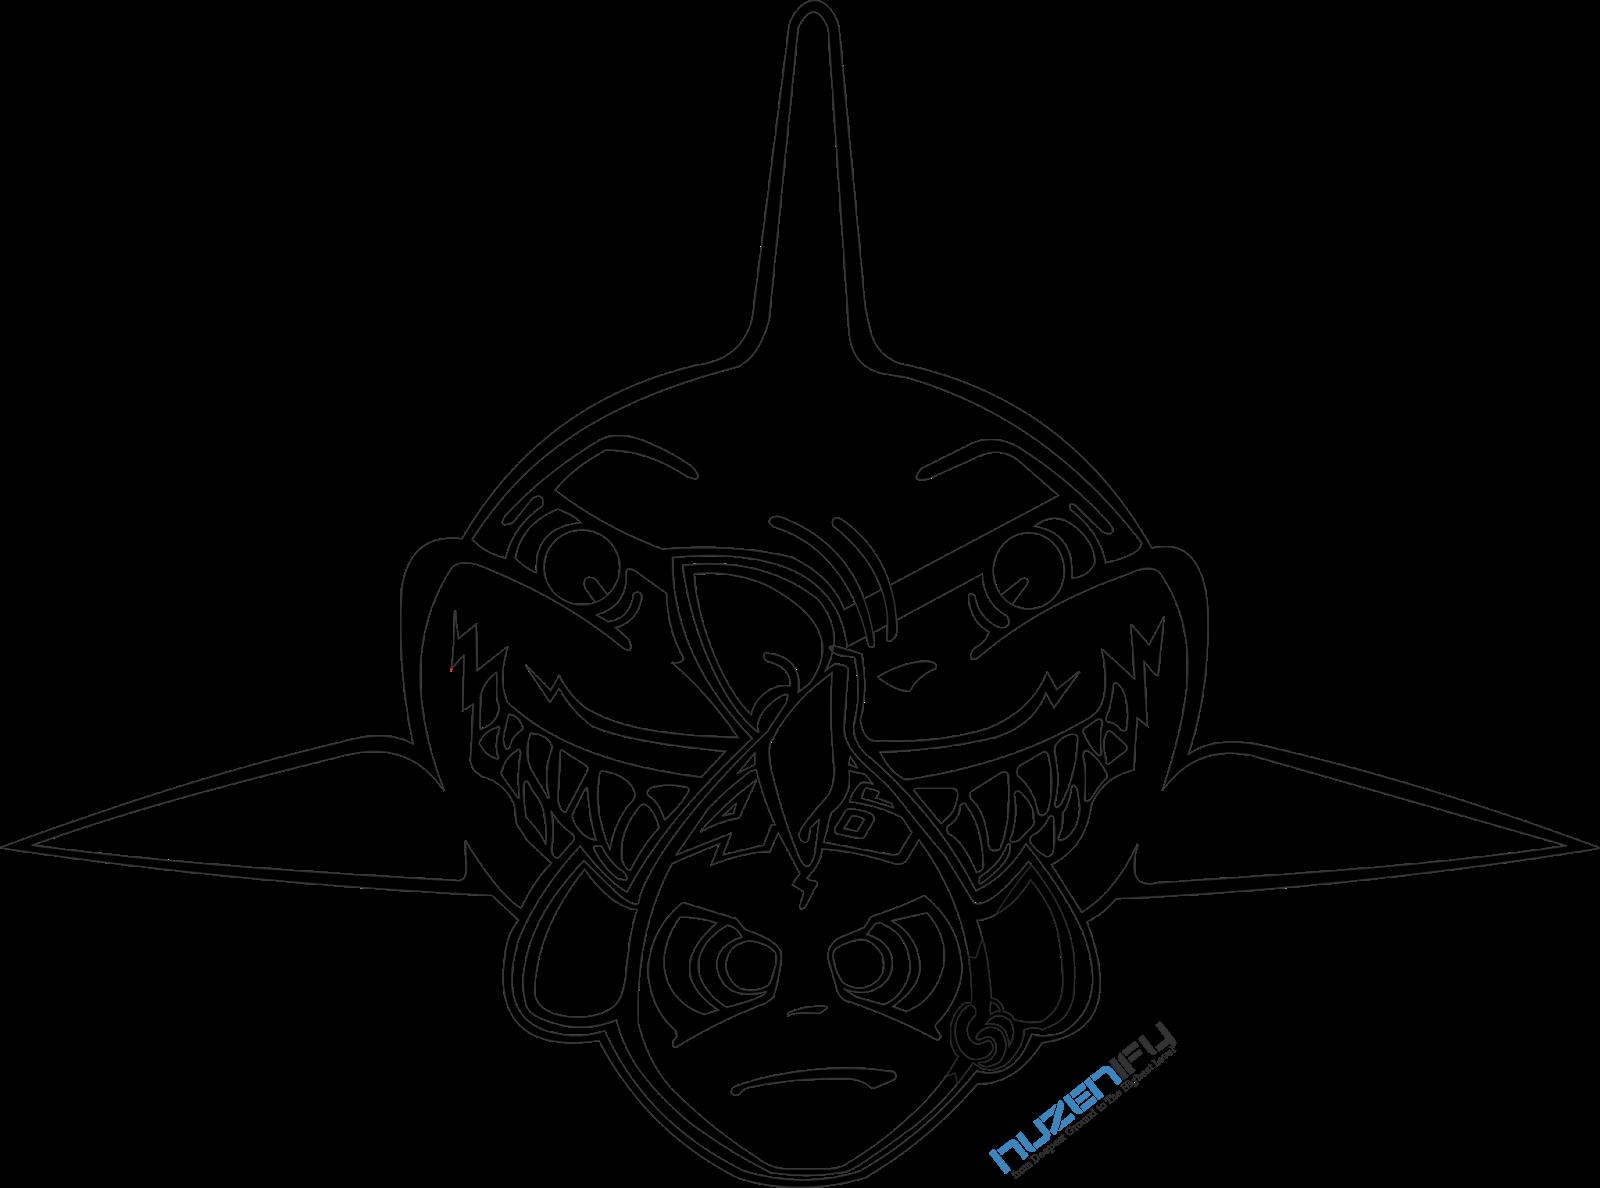 Clipart shark vector. Gambar png helm valentino